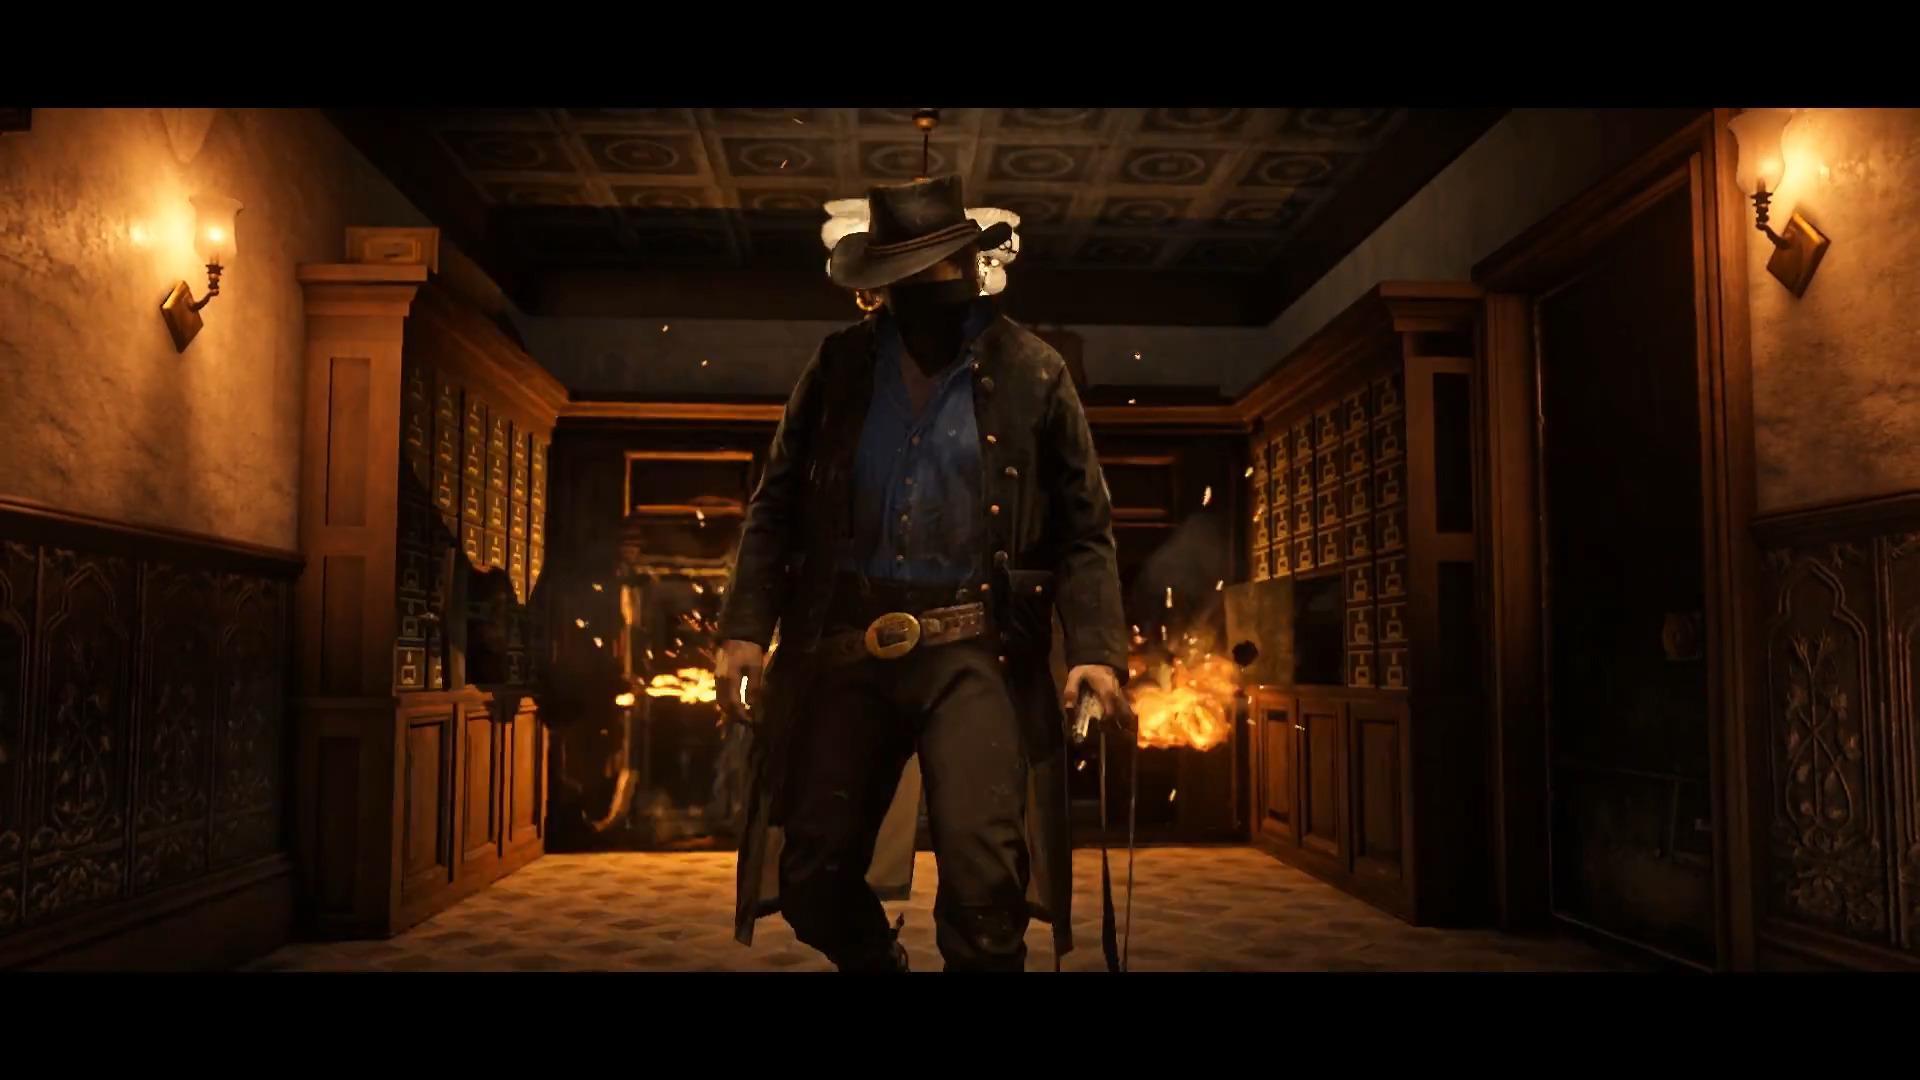 Best 42 Red Dead Redemption Backgrounds On Hipwallpaper